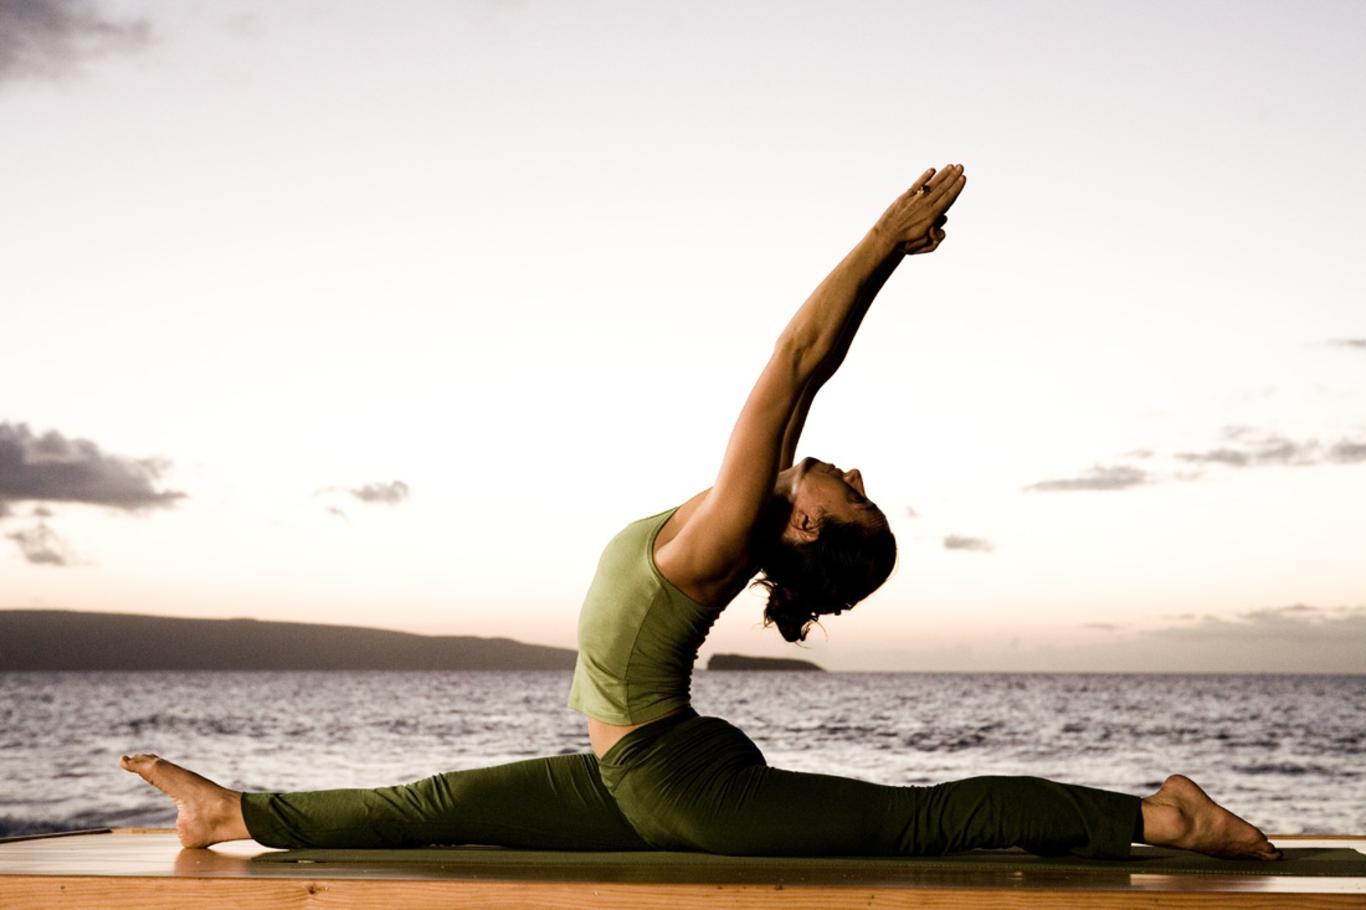 Free Wallpaper Dekstop: Yoga Girls Wallpaper  Free Wallpaper ...